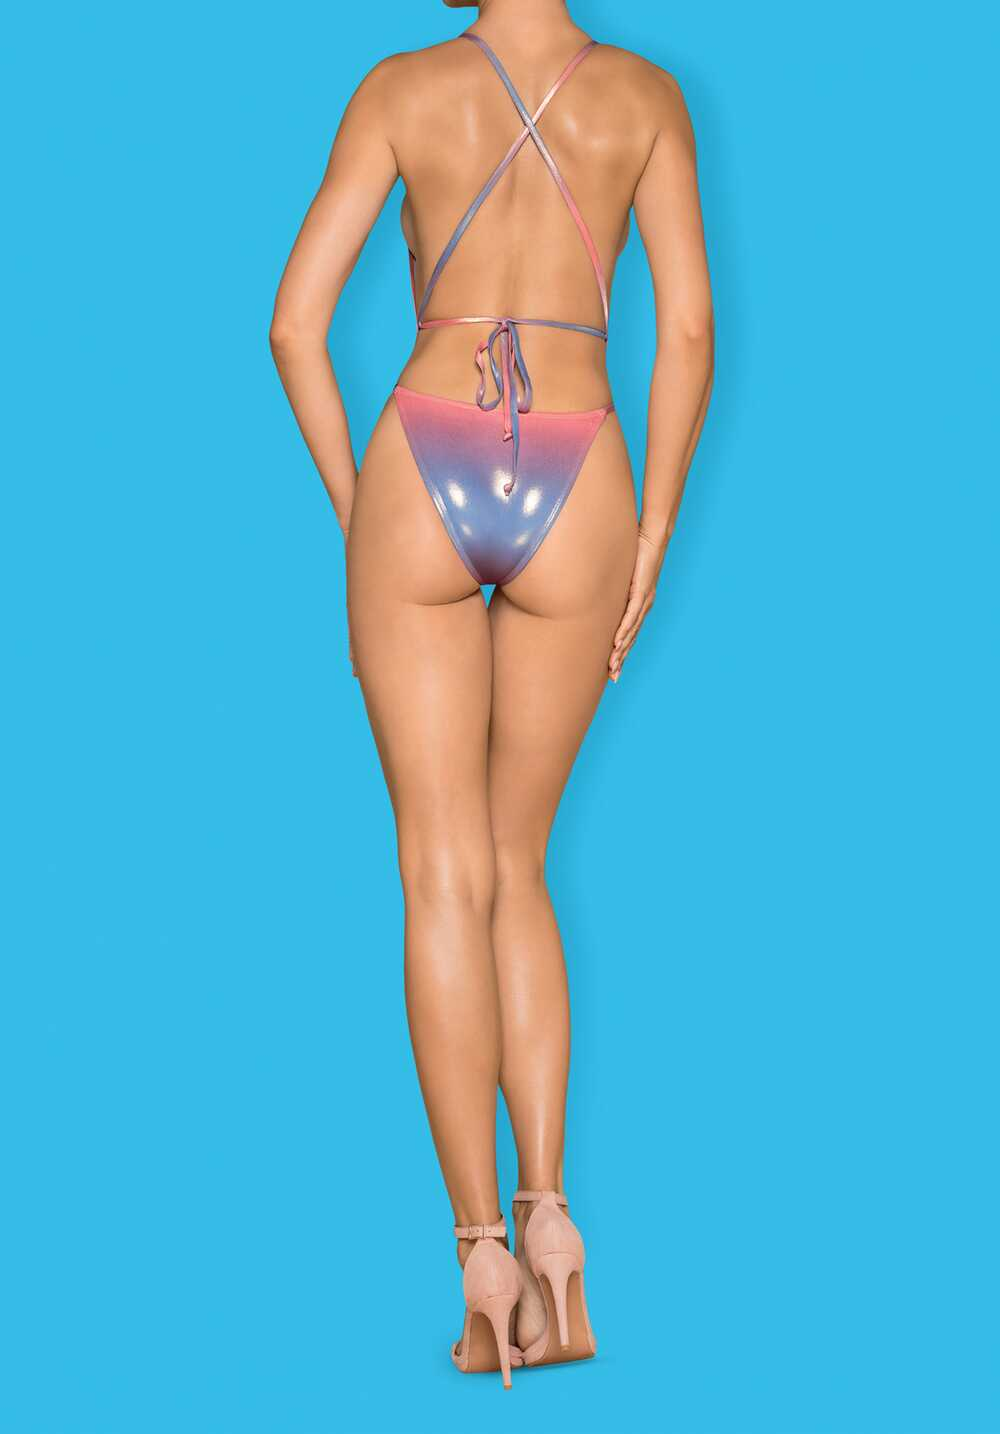 Afbeelding7 Artikel: Glowing swimsuit Variant: 1131 Parent:  Datum: 05/06/2020 17:40:09